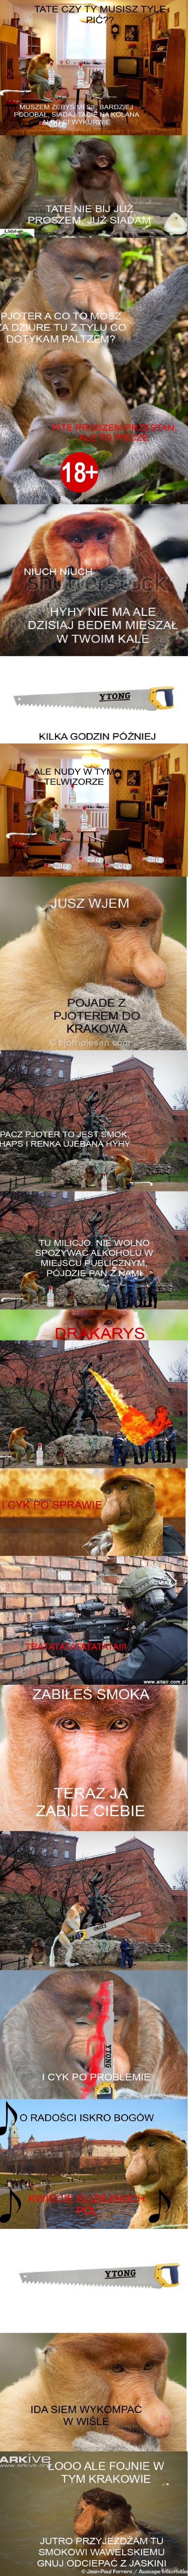 Pioter Jeźdźca Janusza